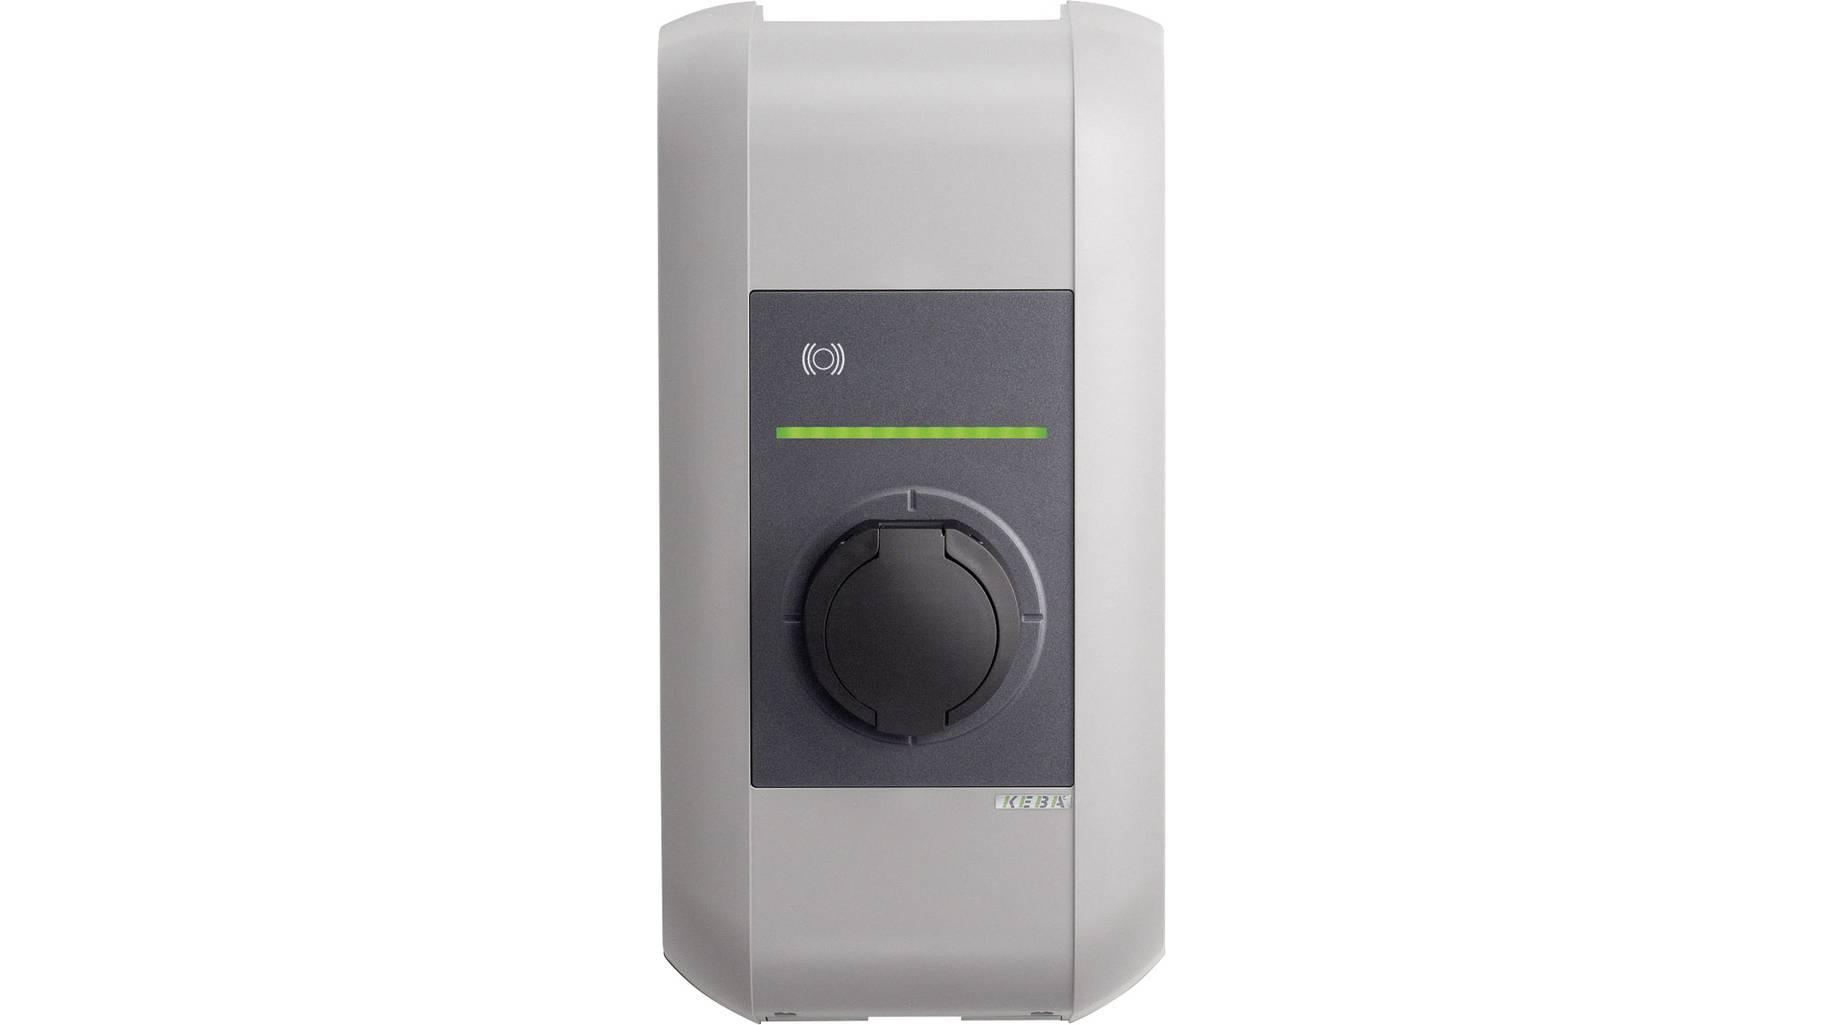 KEBA Wallbox 98.131 KeContact P30b-serie, 22KW, Steckdose, RFID